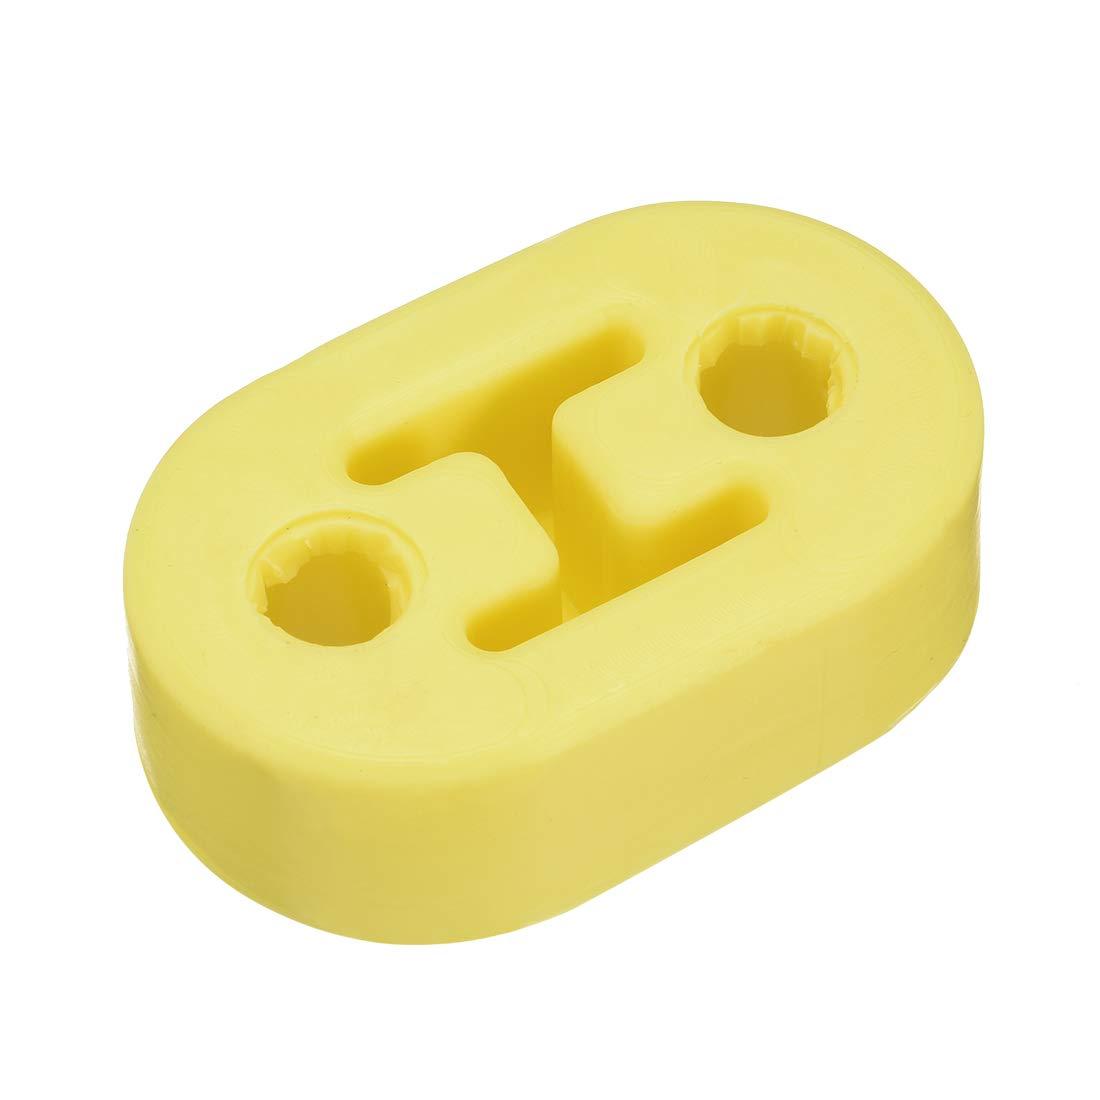 uxcell/® a14022000ux0049 Yellow 4 Holes Car Auto Muffler Exhaust Hanger Bushing 11cm Long